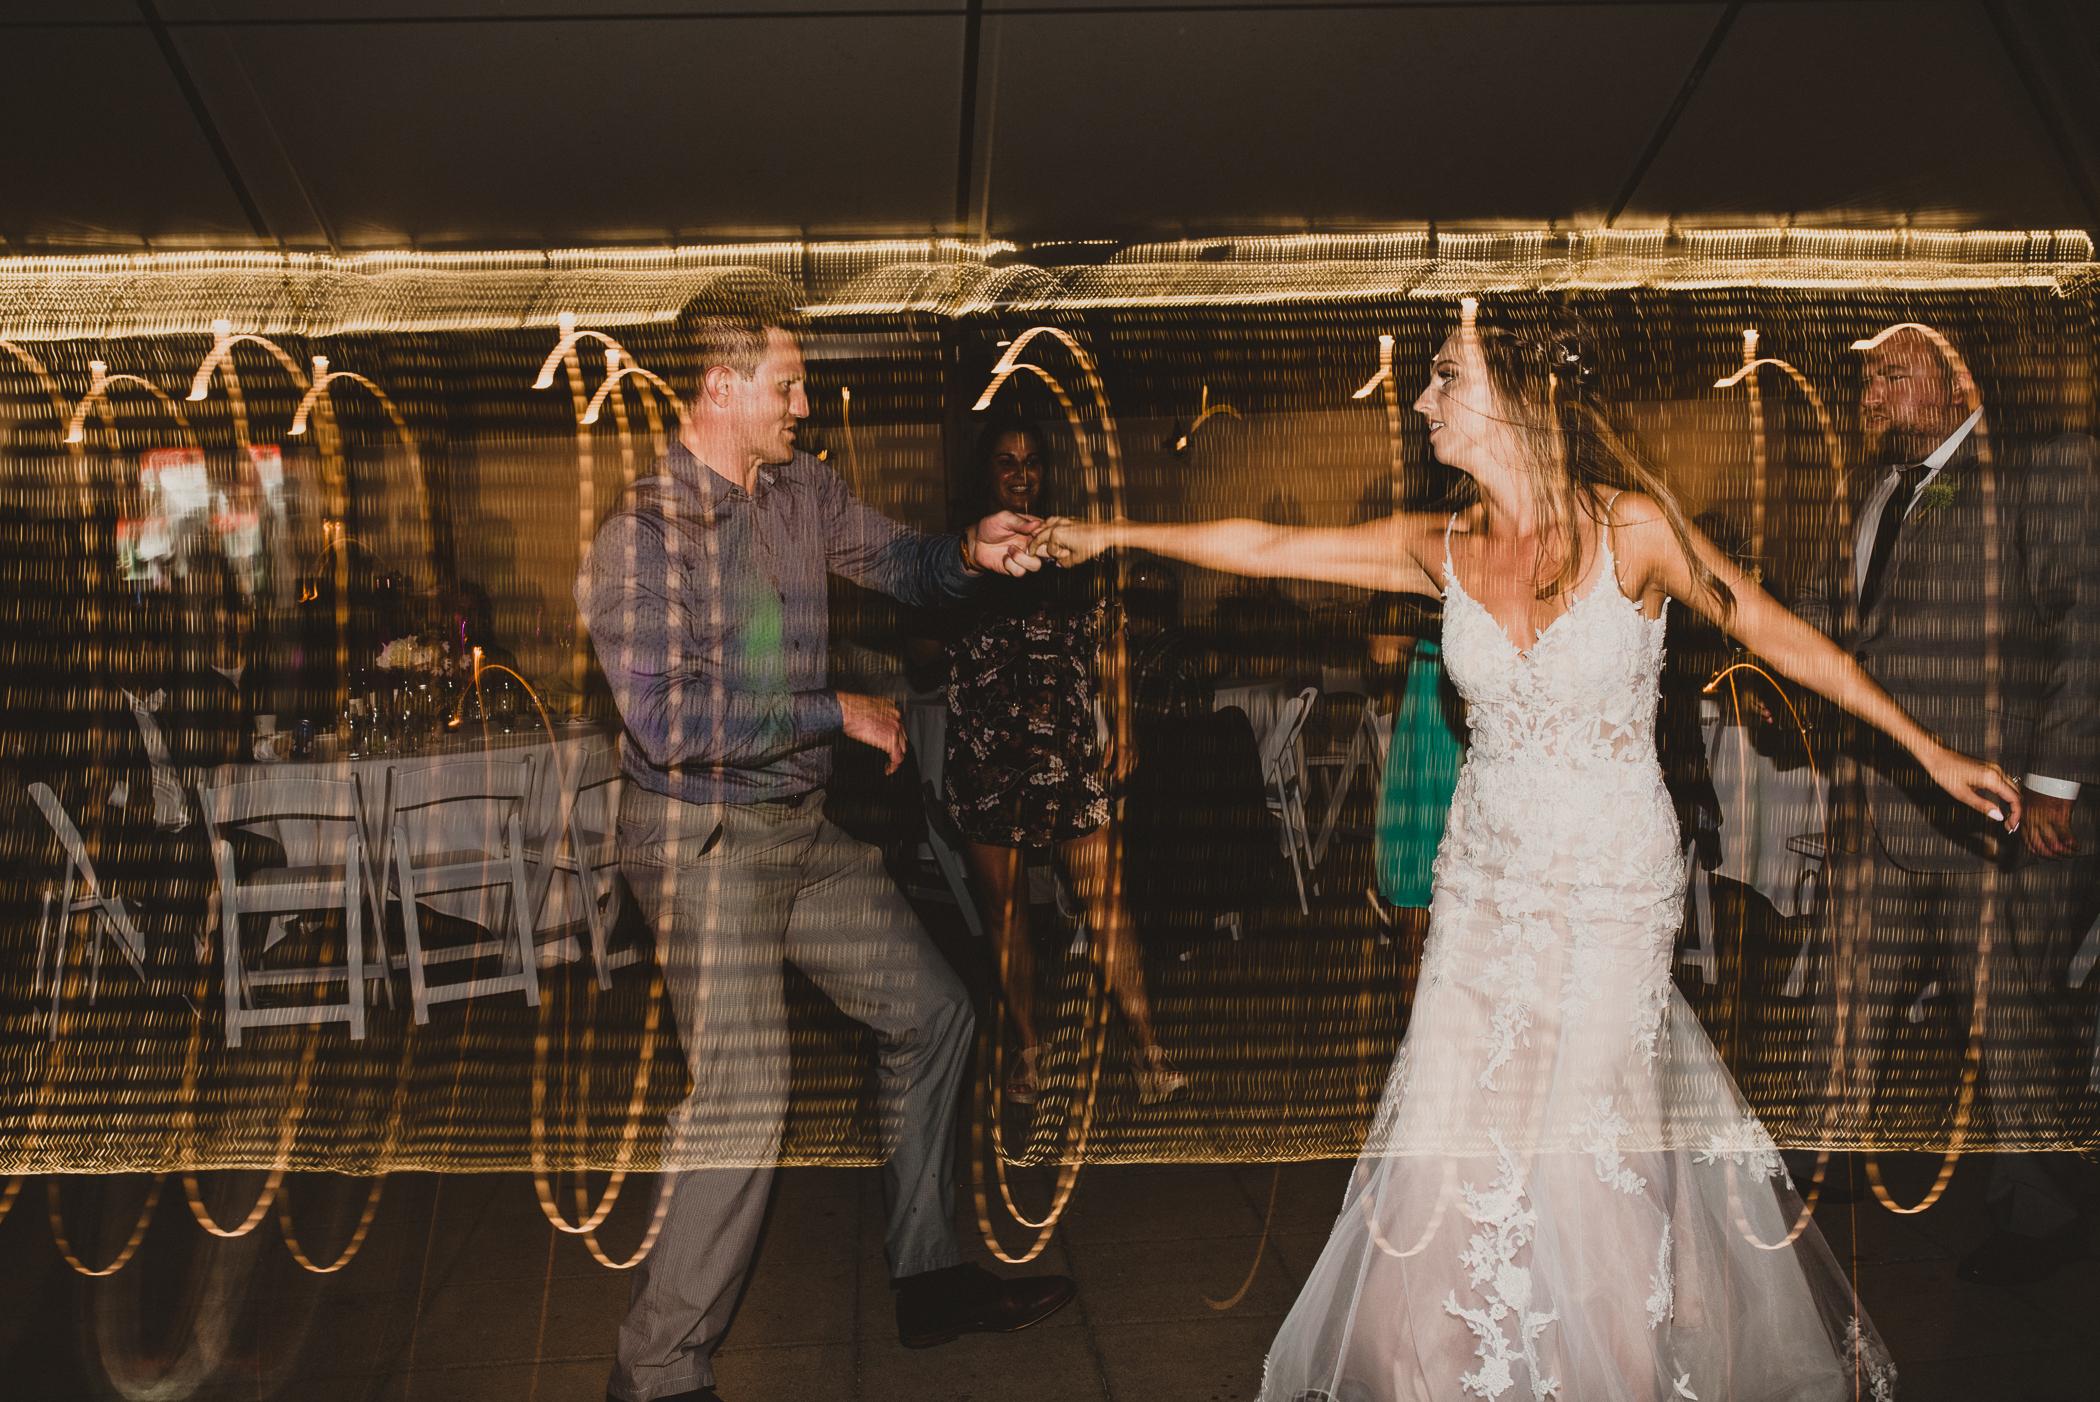 chdance floor flash photos vancouver wedding photography